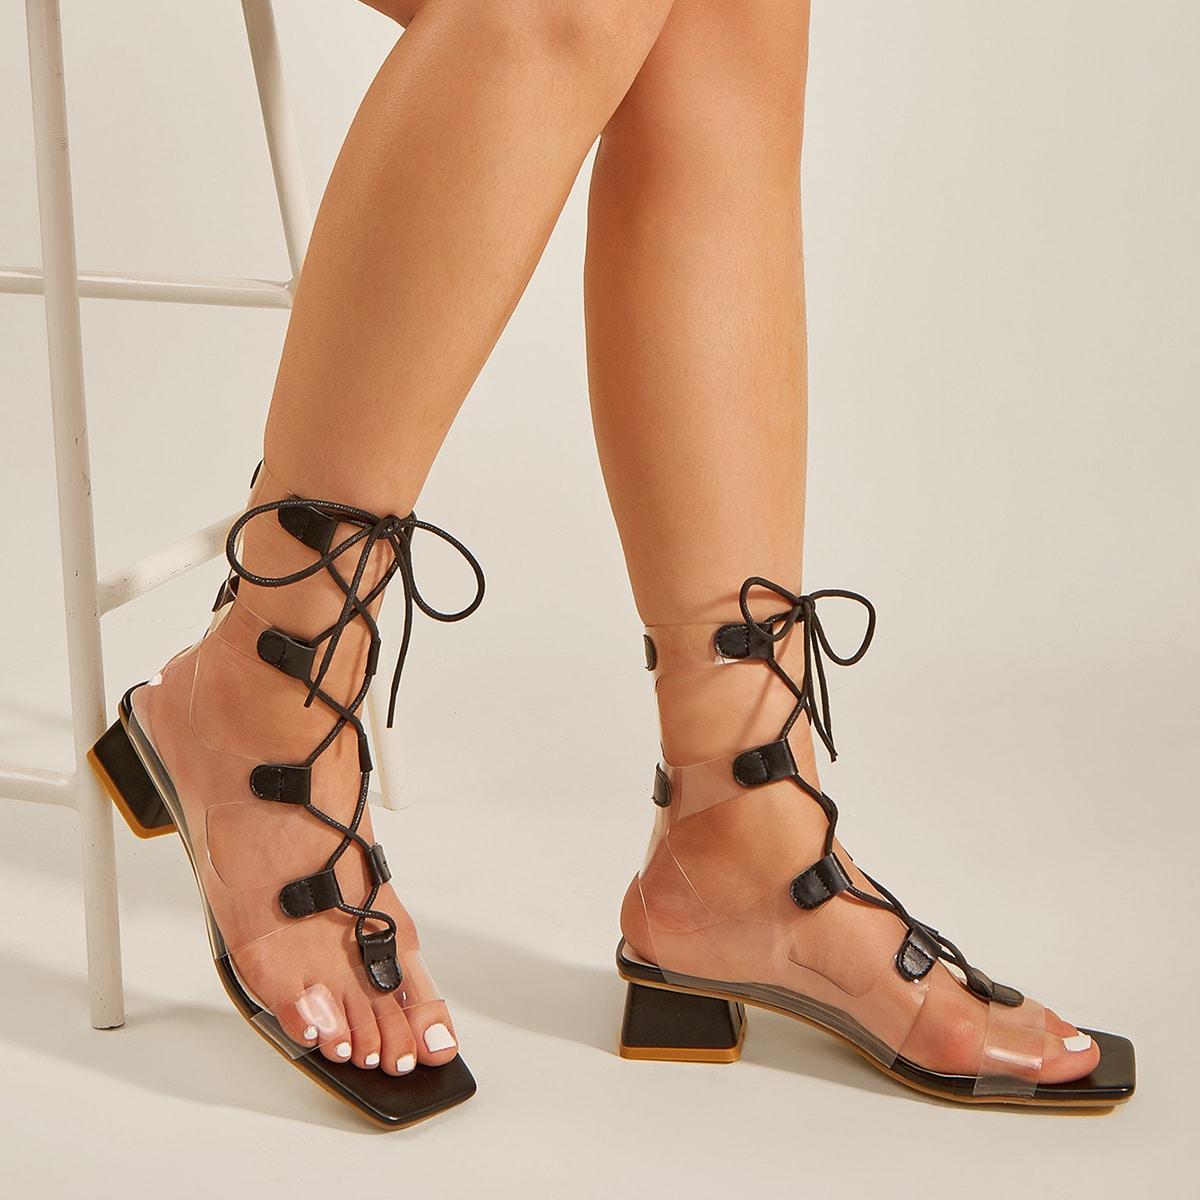 на шнурках Одноцветный Модный Сандалии/босоножки